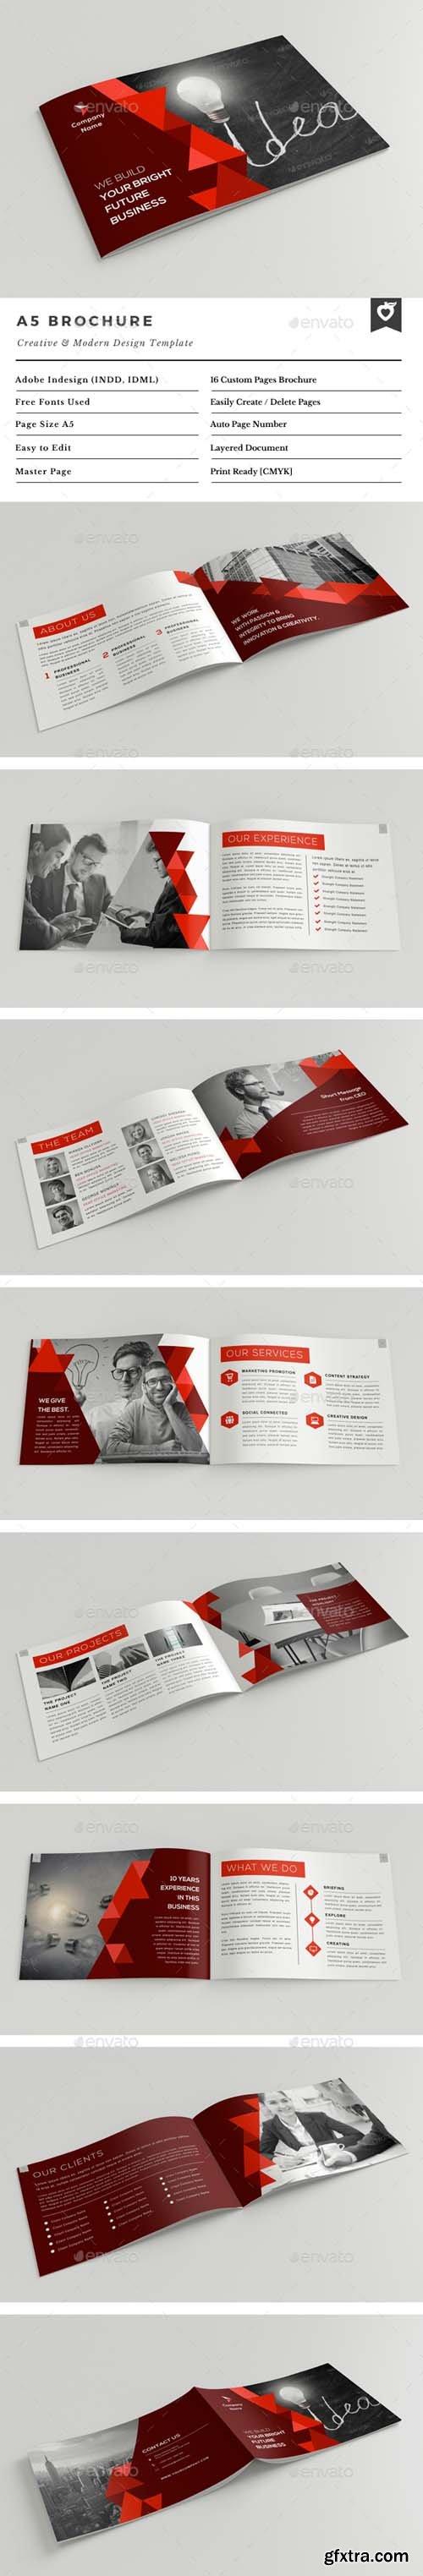 GR - A5 Brochure 13066155